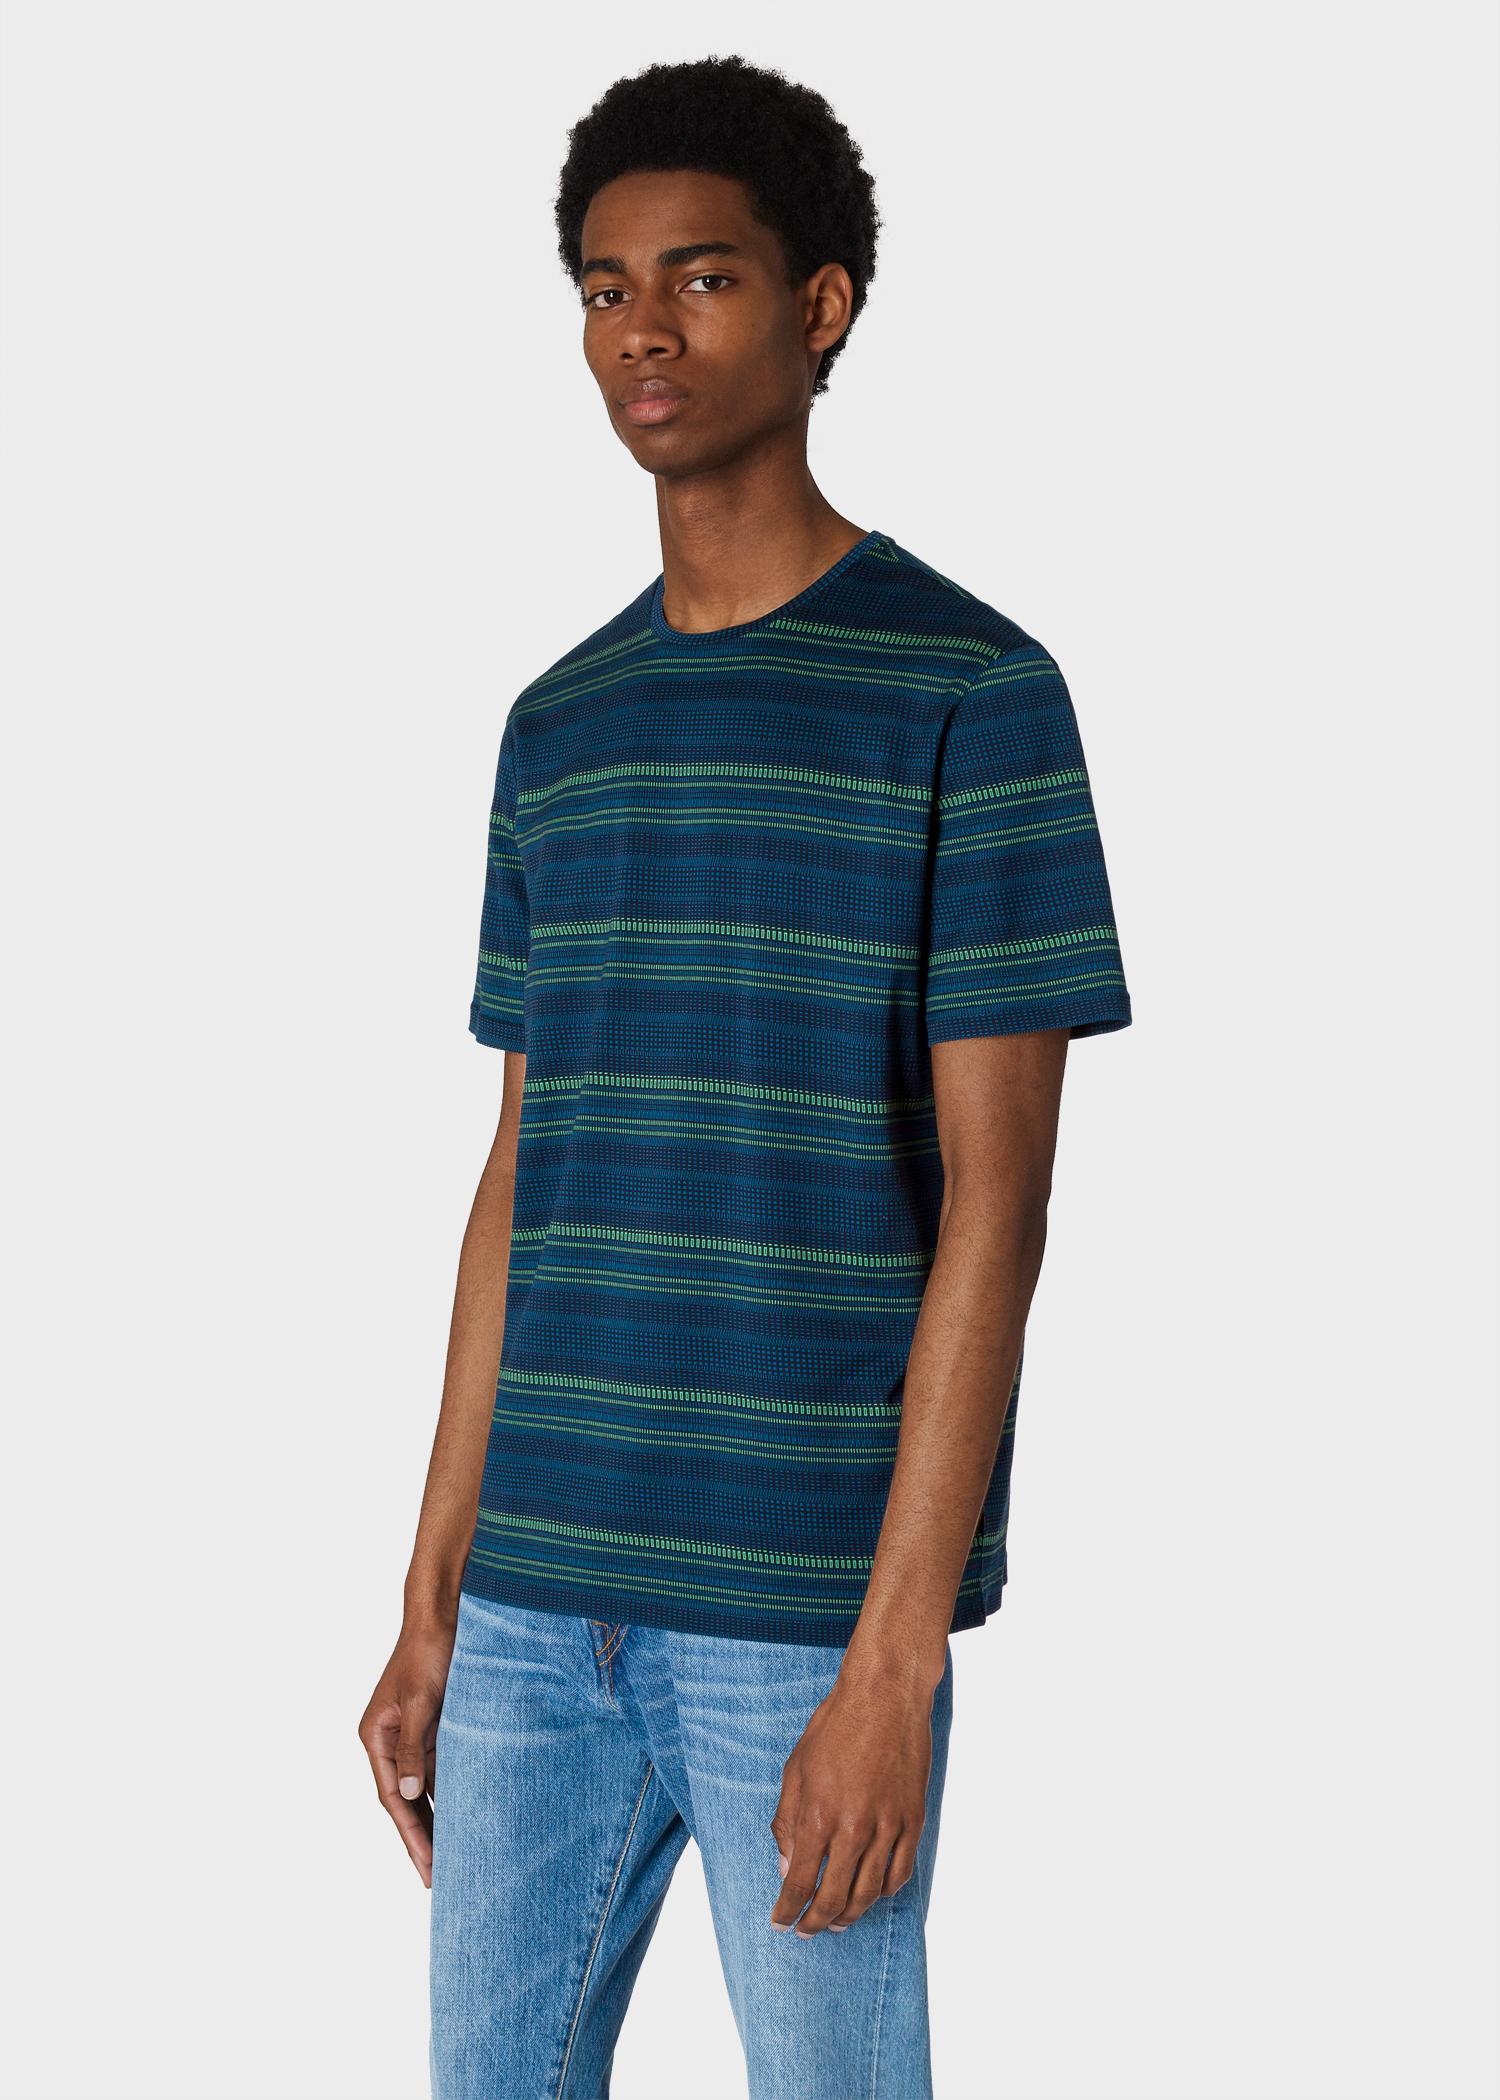 503604b3d0 Model front close up - Men's Navy Geo-Stripe Jacquard T-Shirt Paul Smith